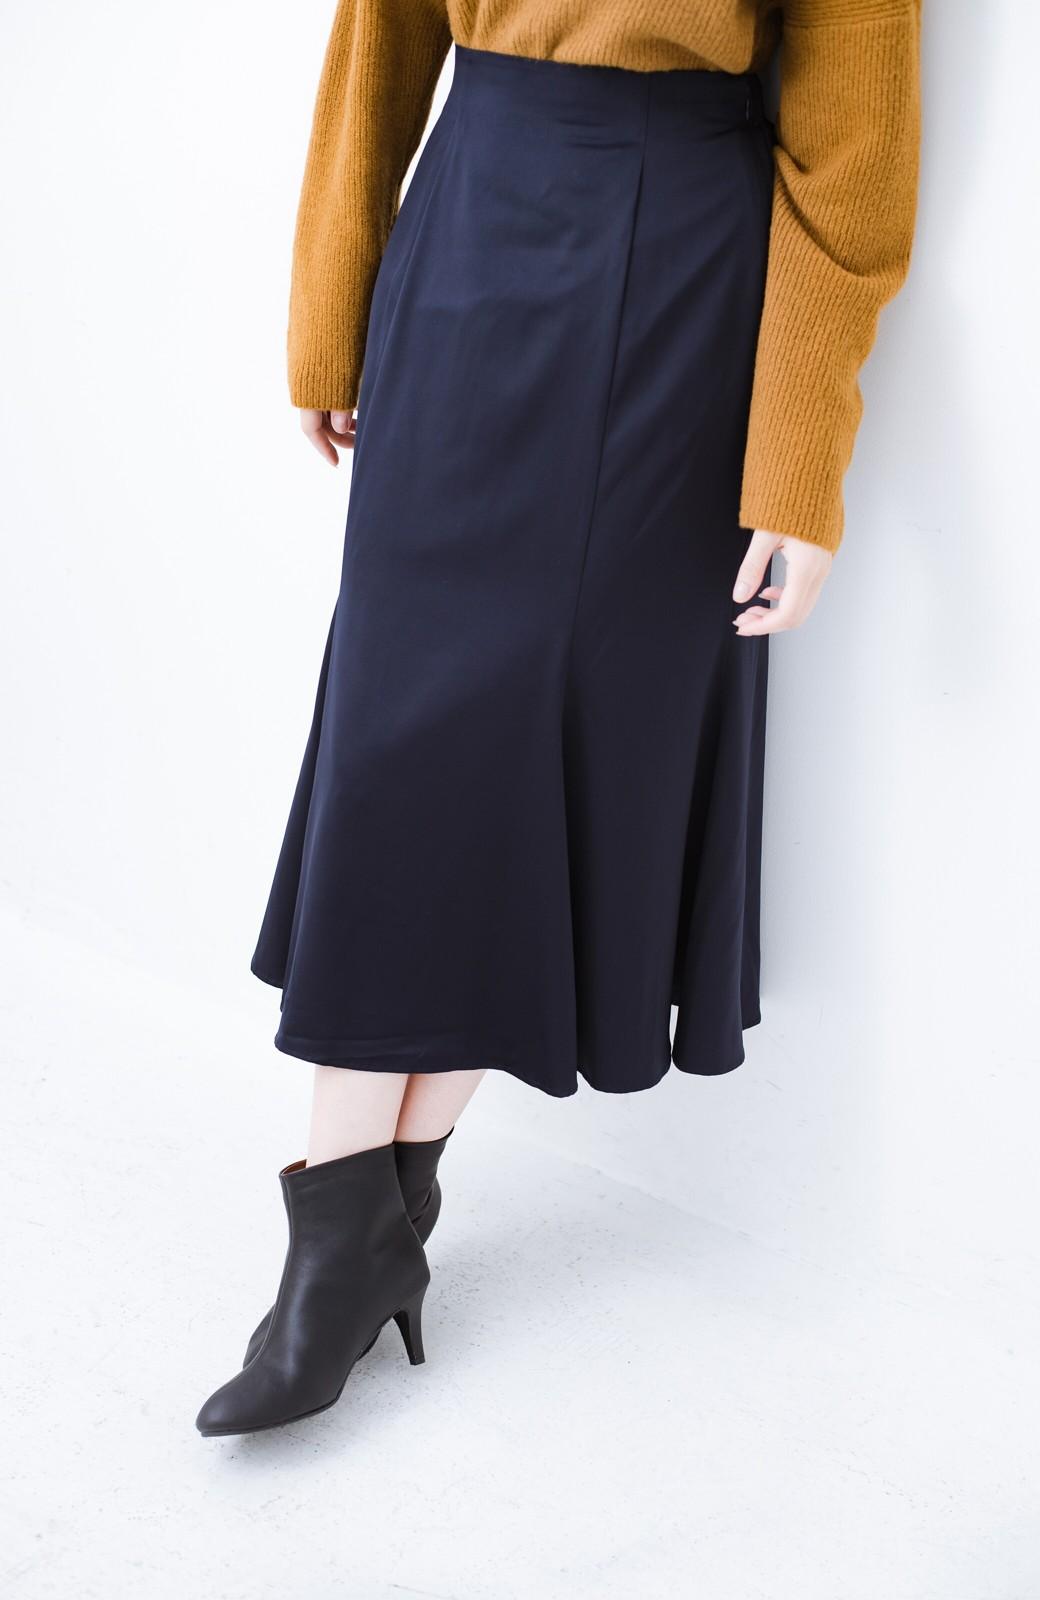 haco! スウェットやスニーカーを合わせても女っぽくいられるサテンマーメイドスカート by que made me <ネイビー>の商品写真6